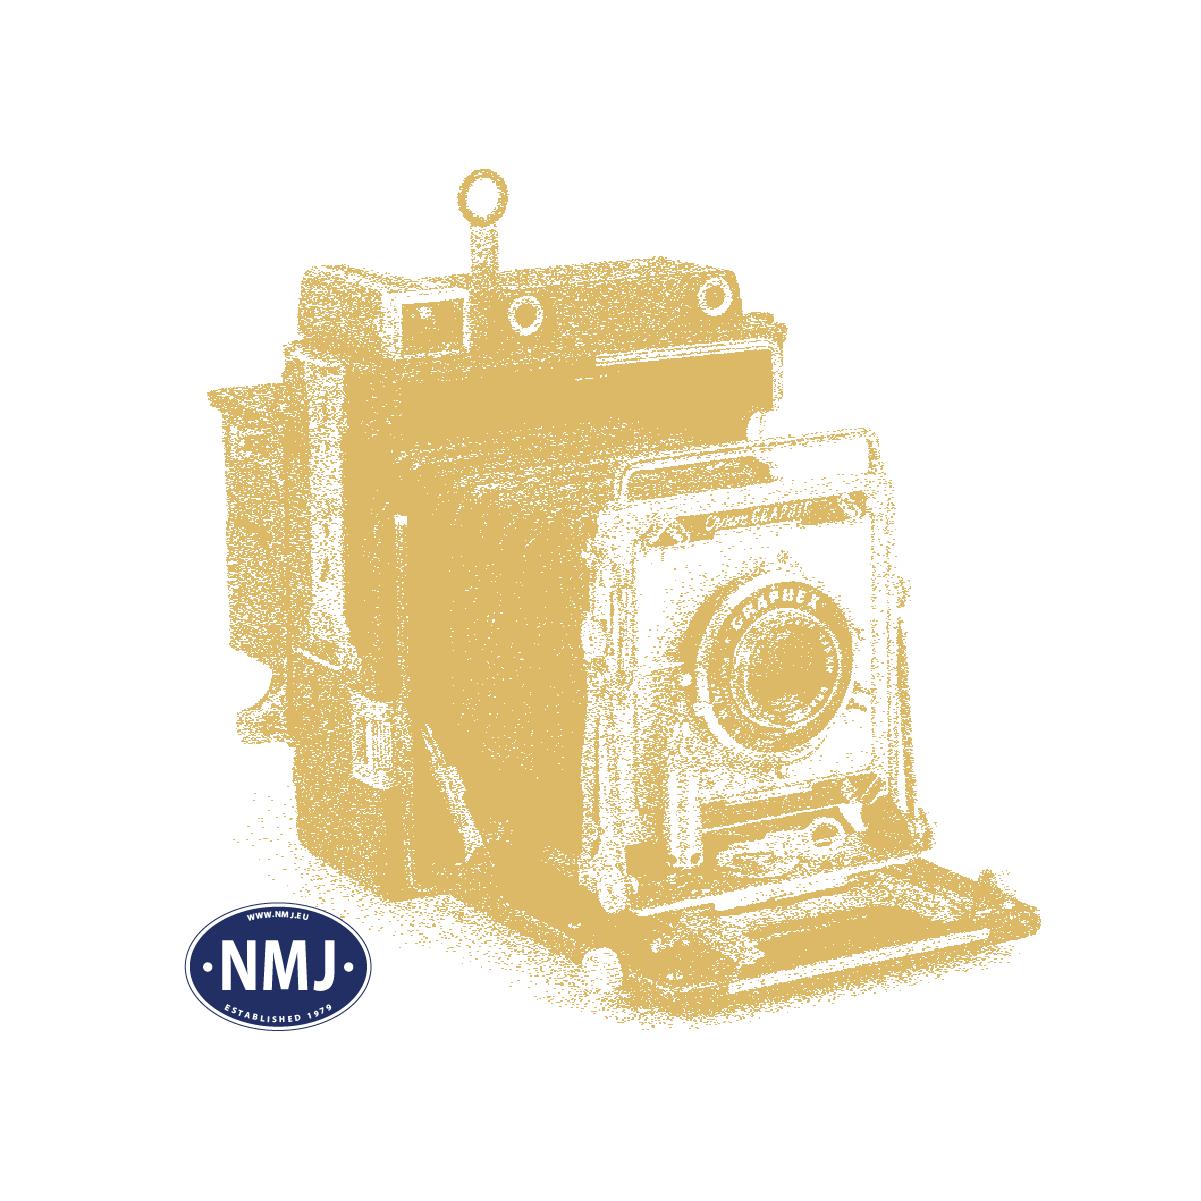 NMJT206.101 - NMJ Topline SJ B1c 5166 Restaurantvogn, Originalversjon